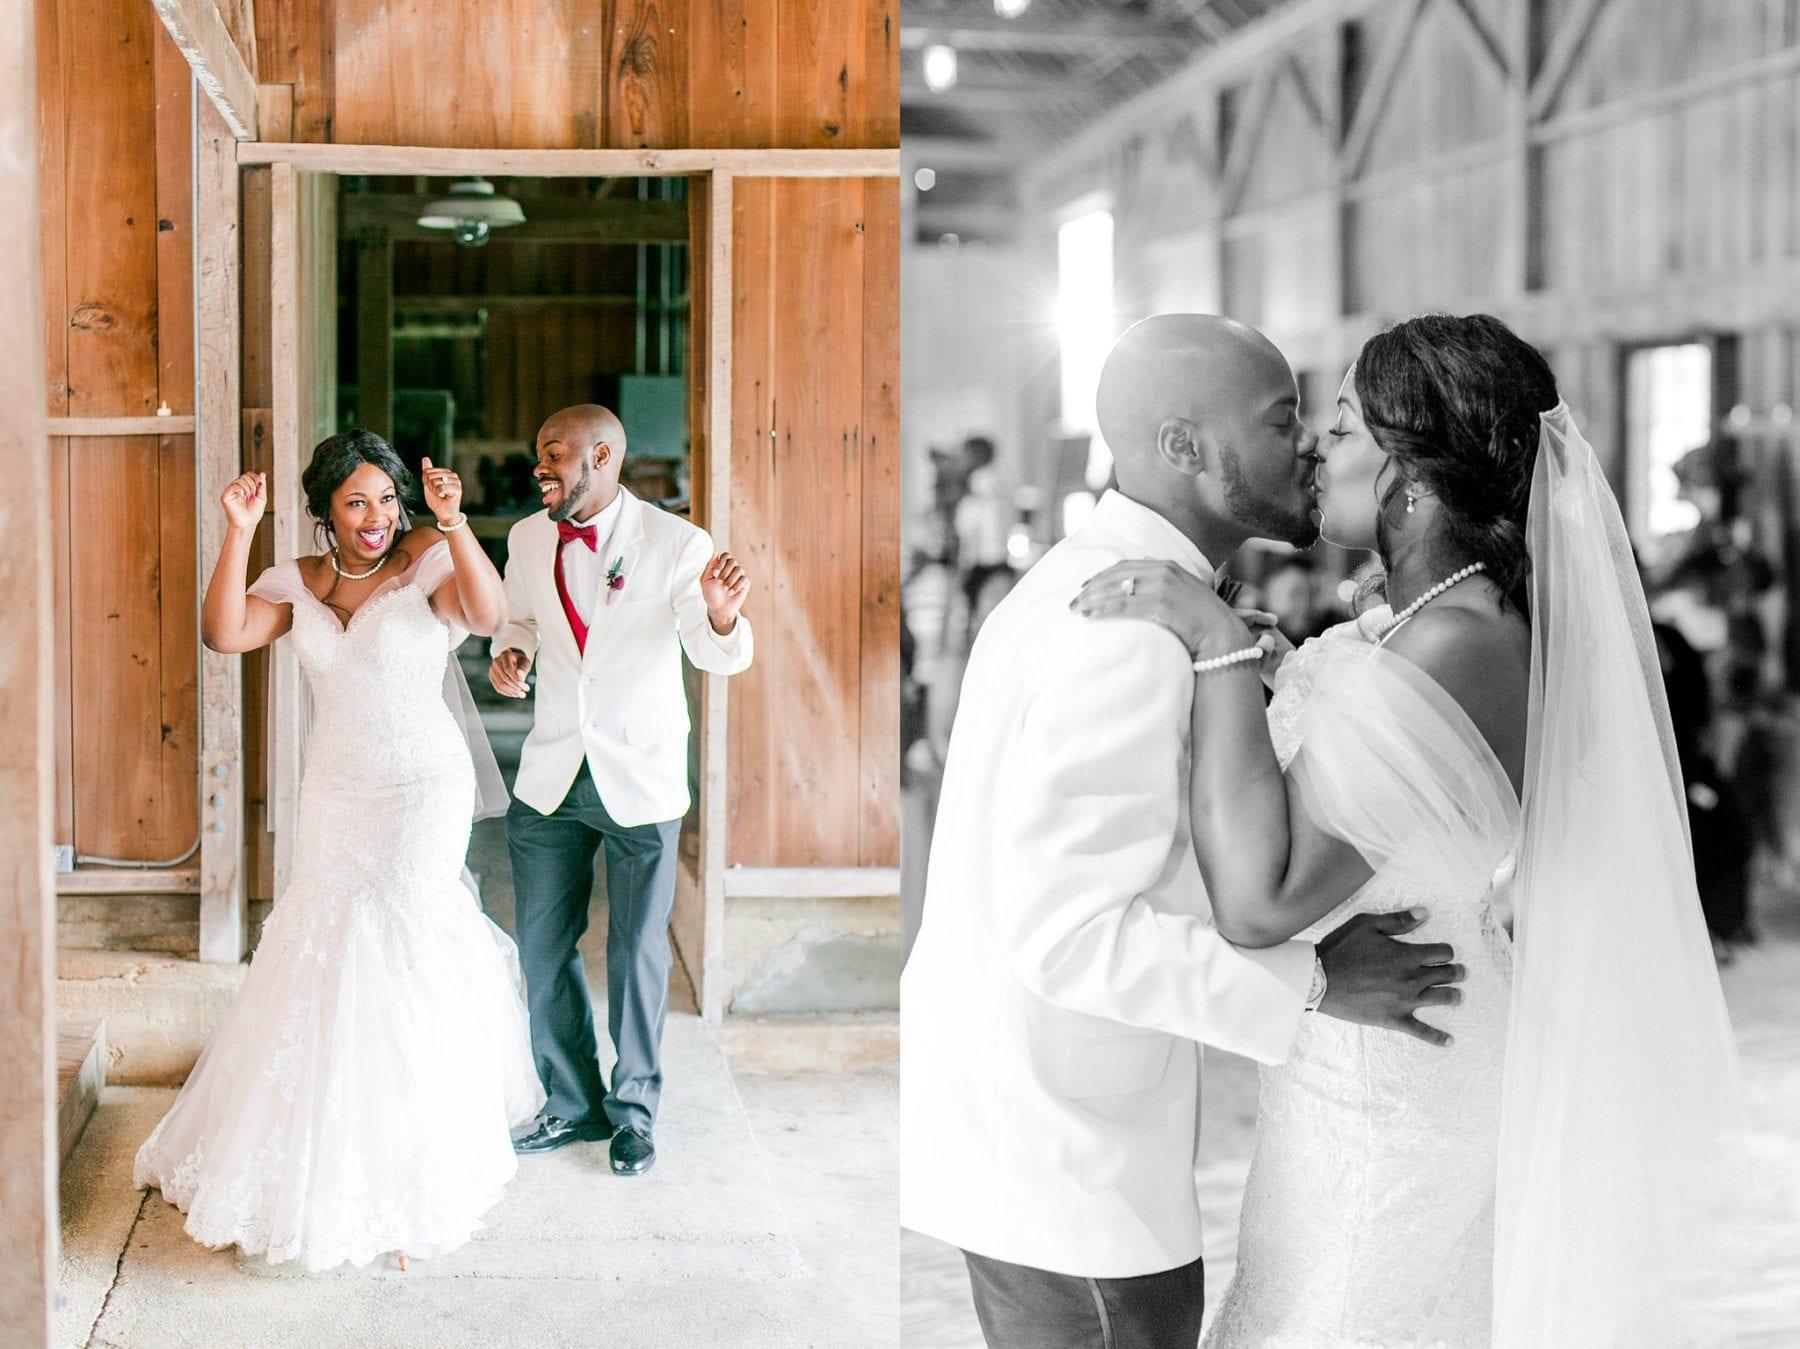 Jefferson Patterson Park Wedding Maryland Wedding Photographer Megan Kelsey Photography Jasmine & Seyi-111.jpg